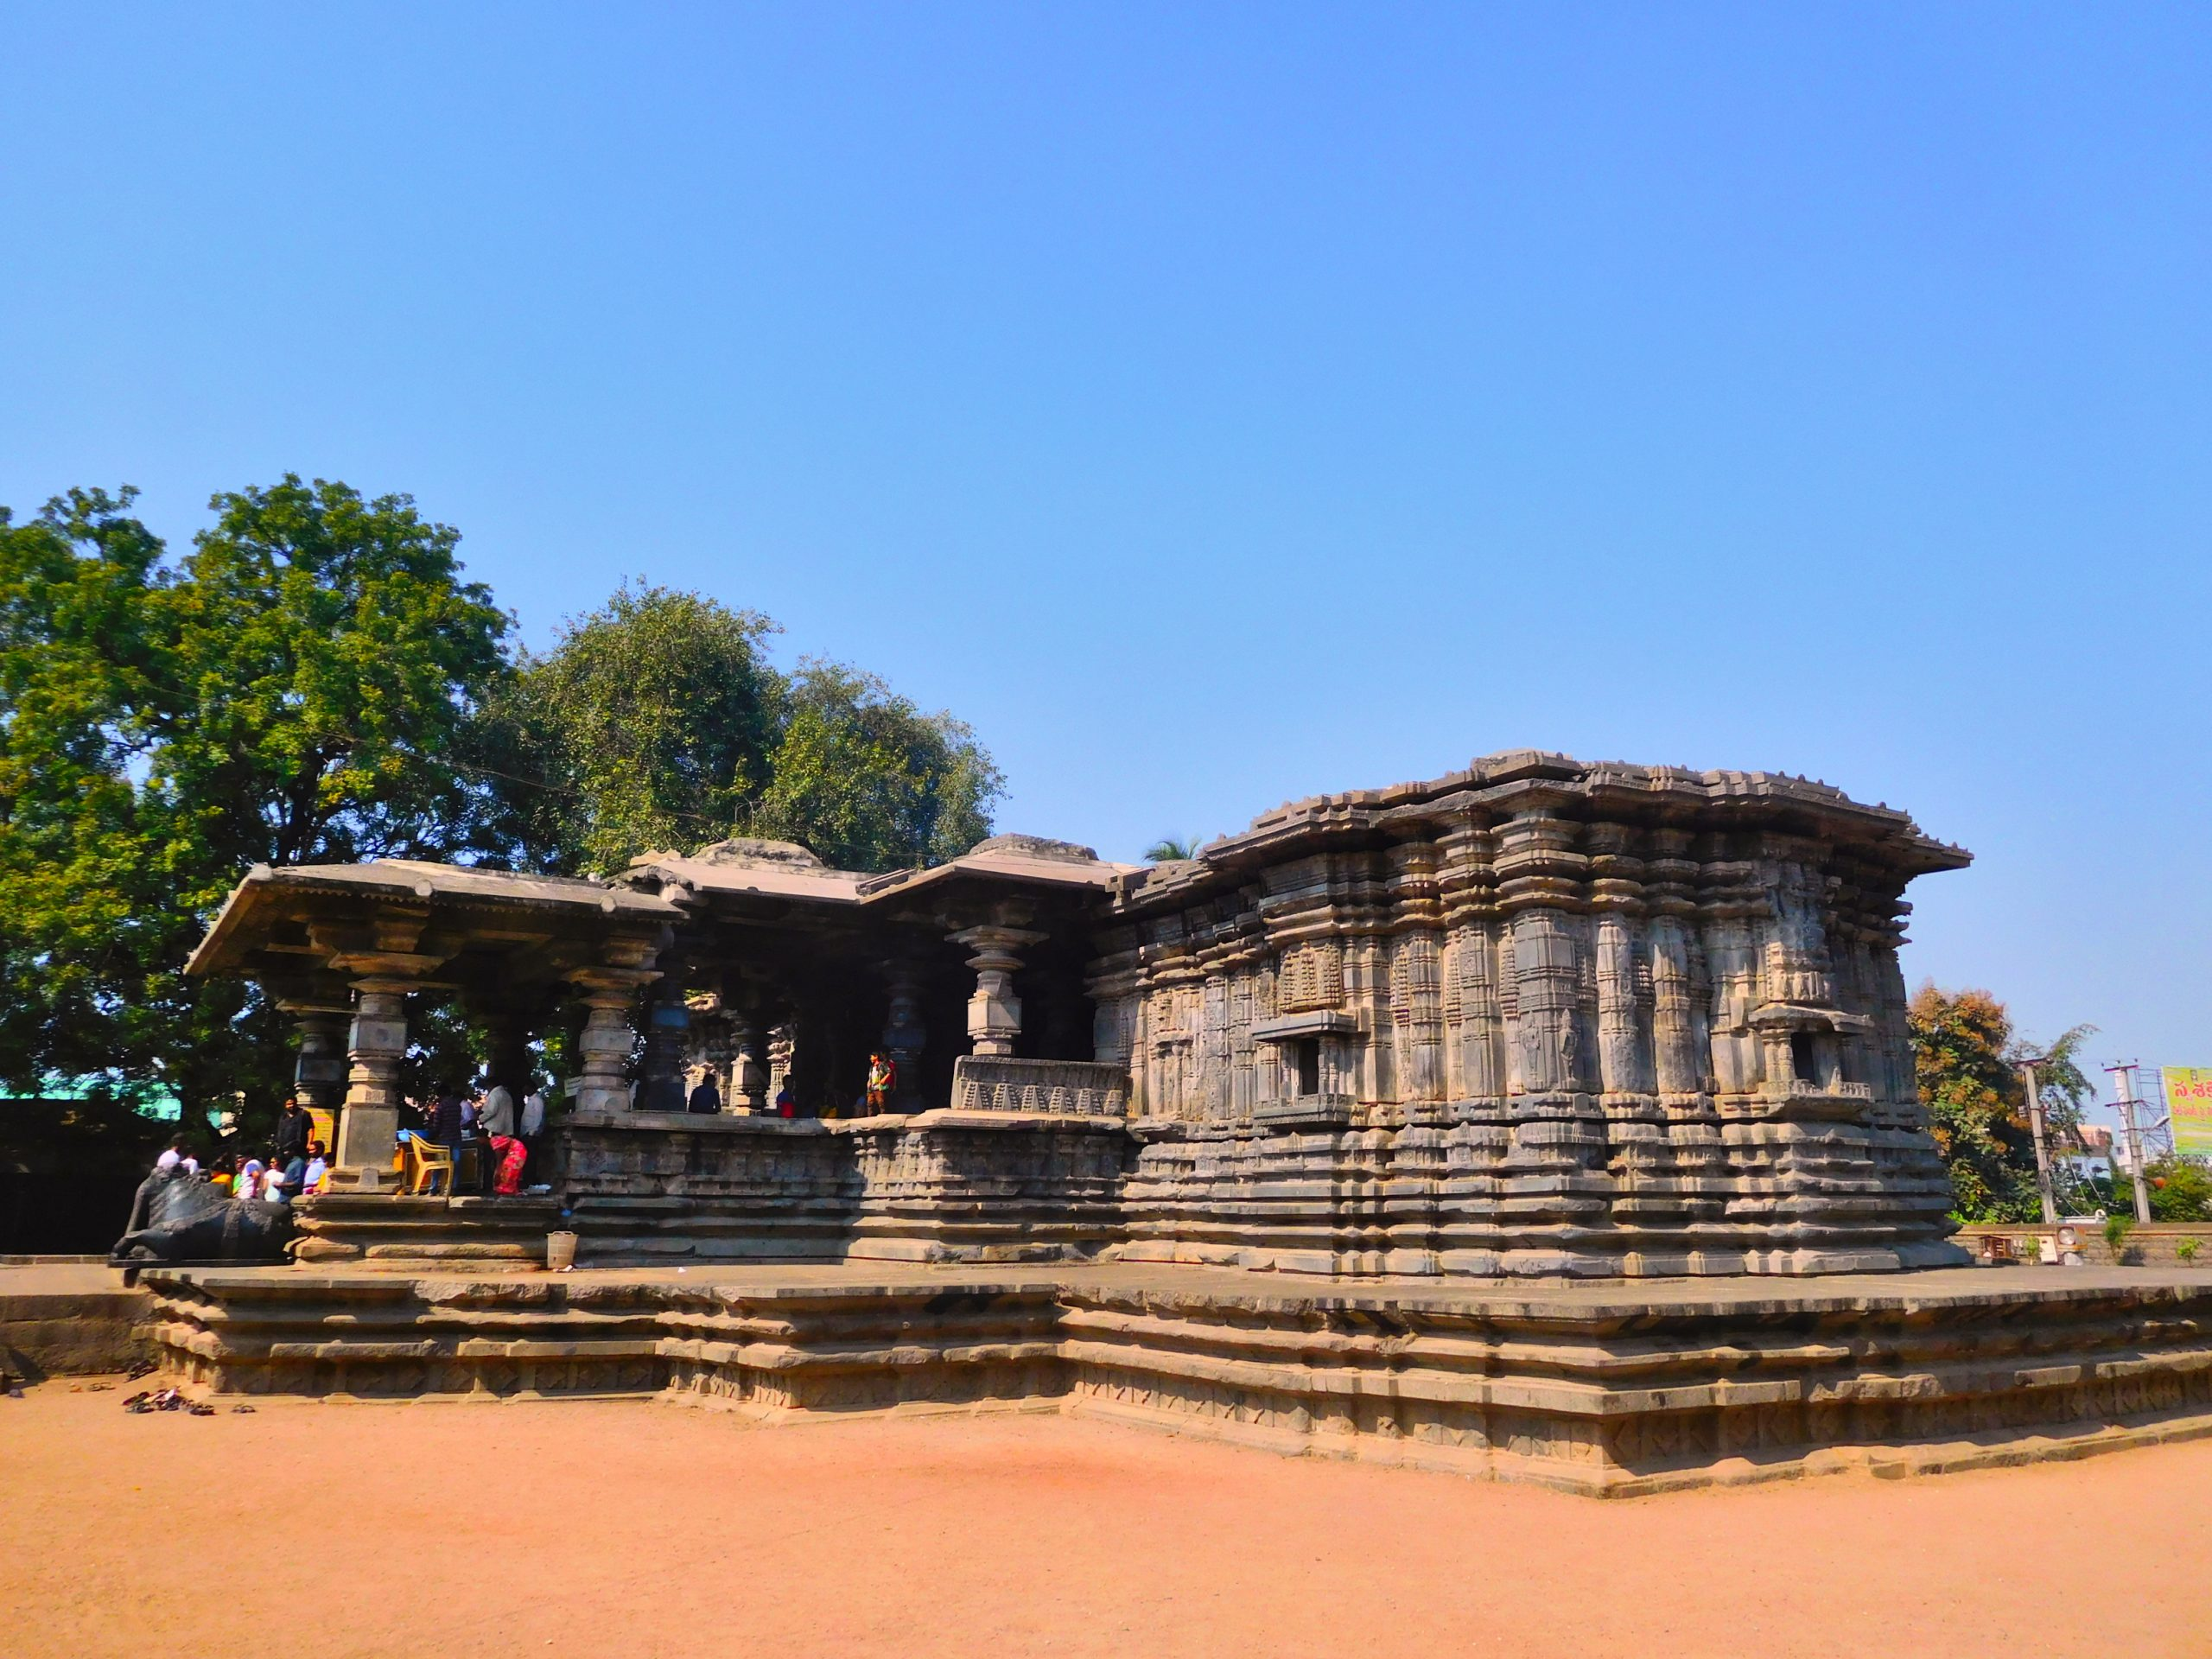 Amazing Temple in Telangana-Thousand Pillars Temple